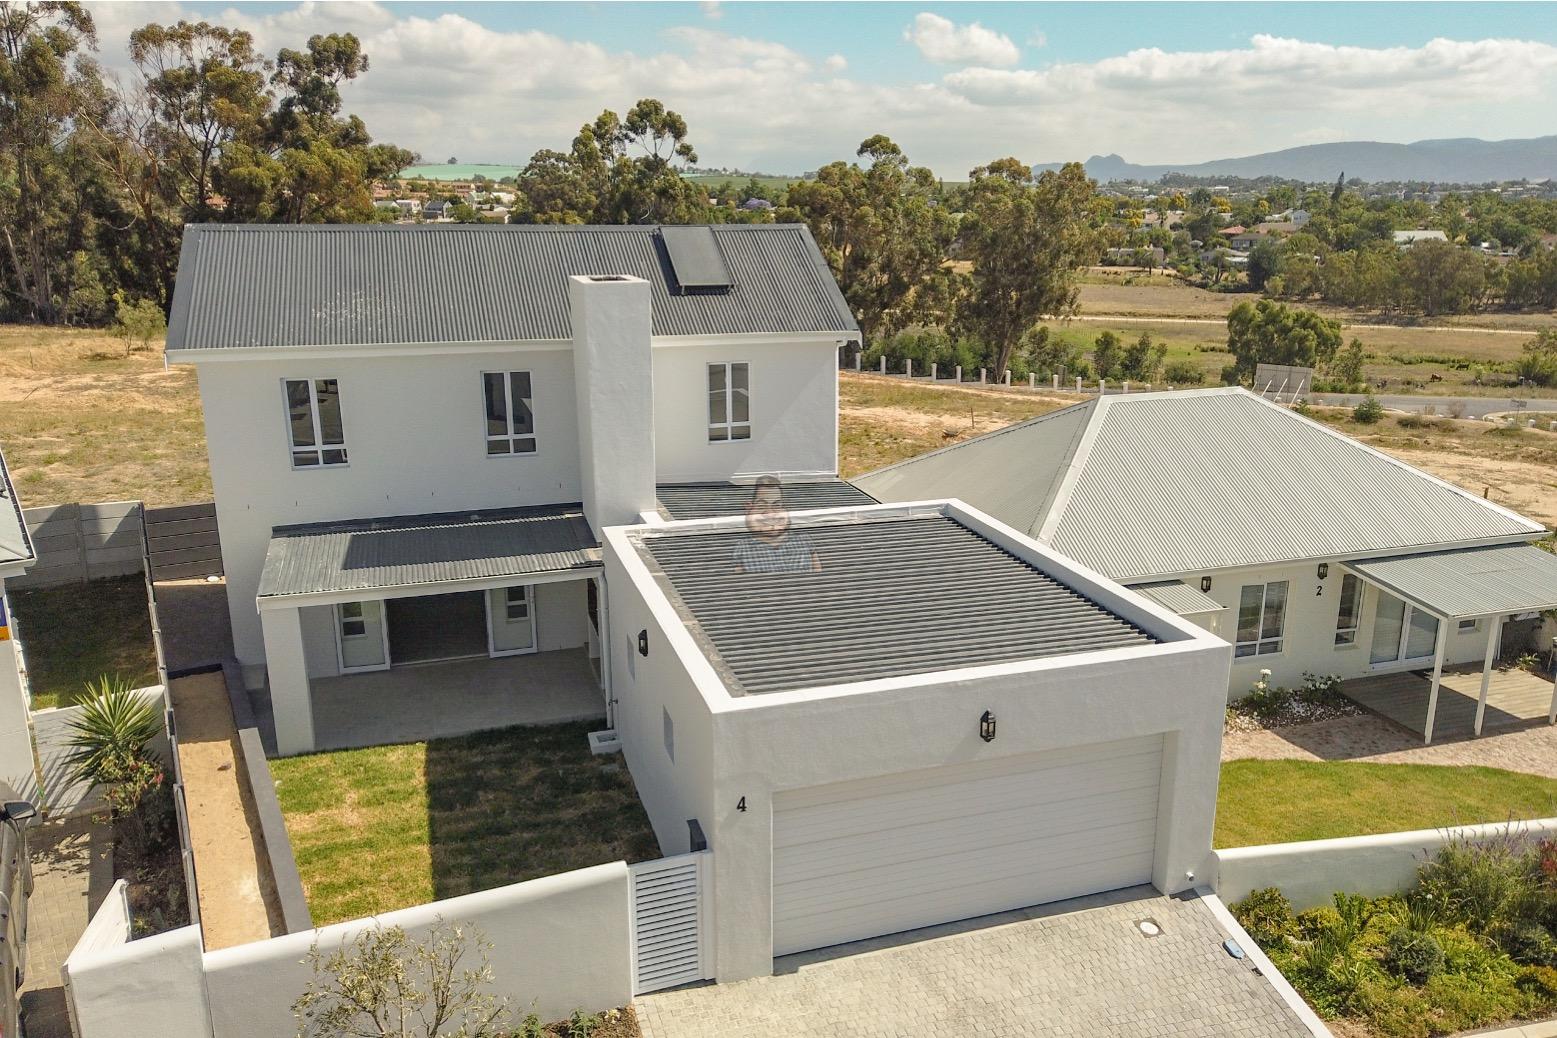 New Home - Stadsig Security Estate